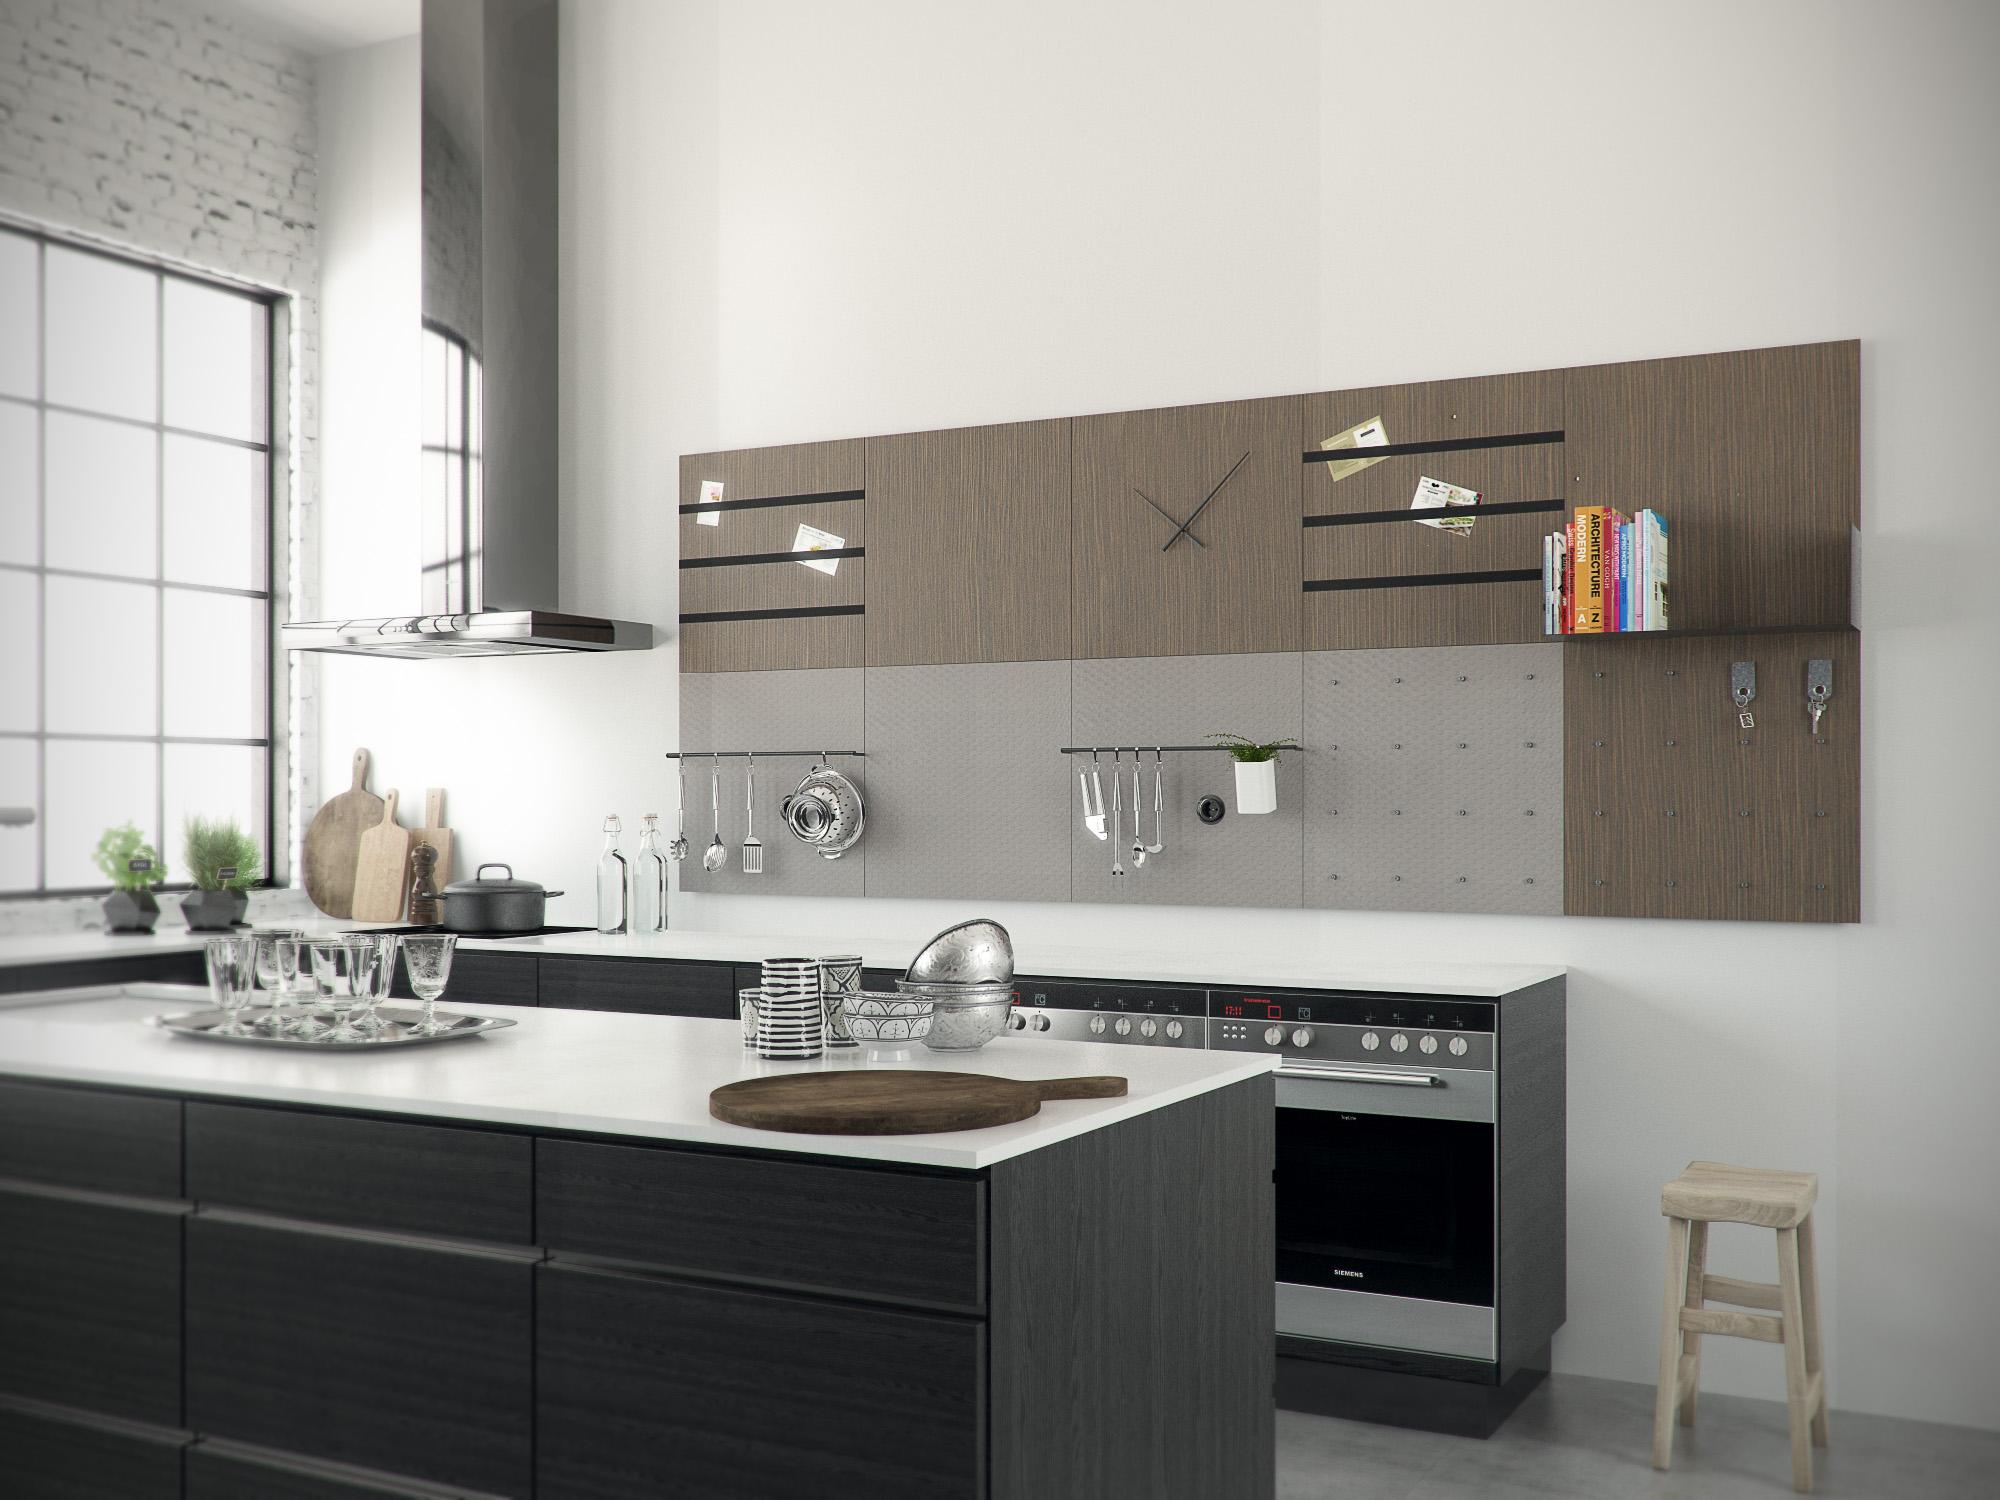 Stylepads van Dock Four - Keuken